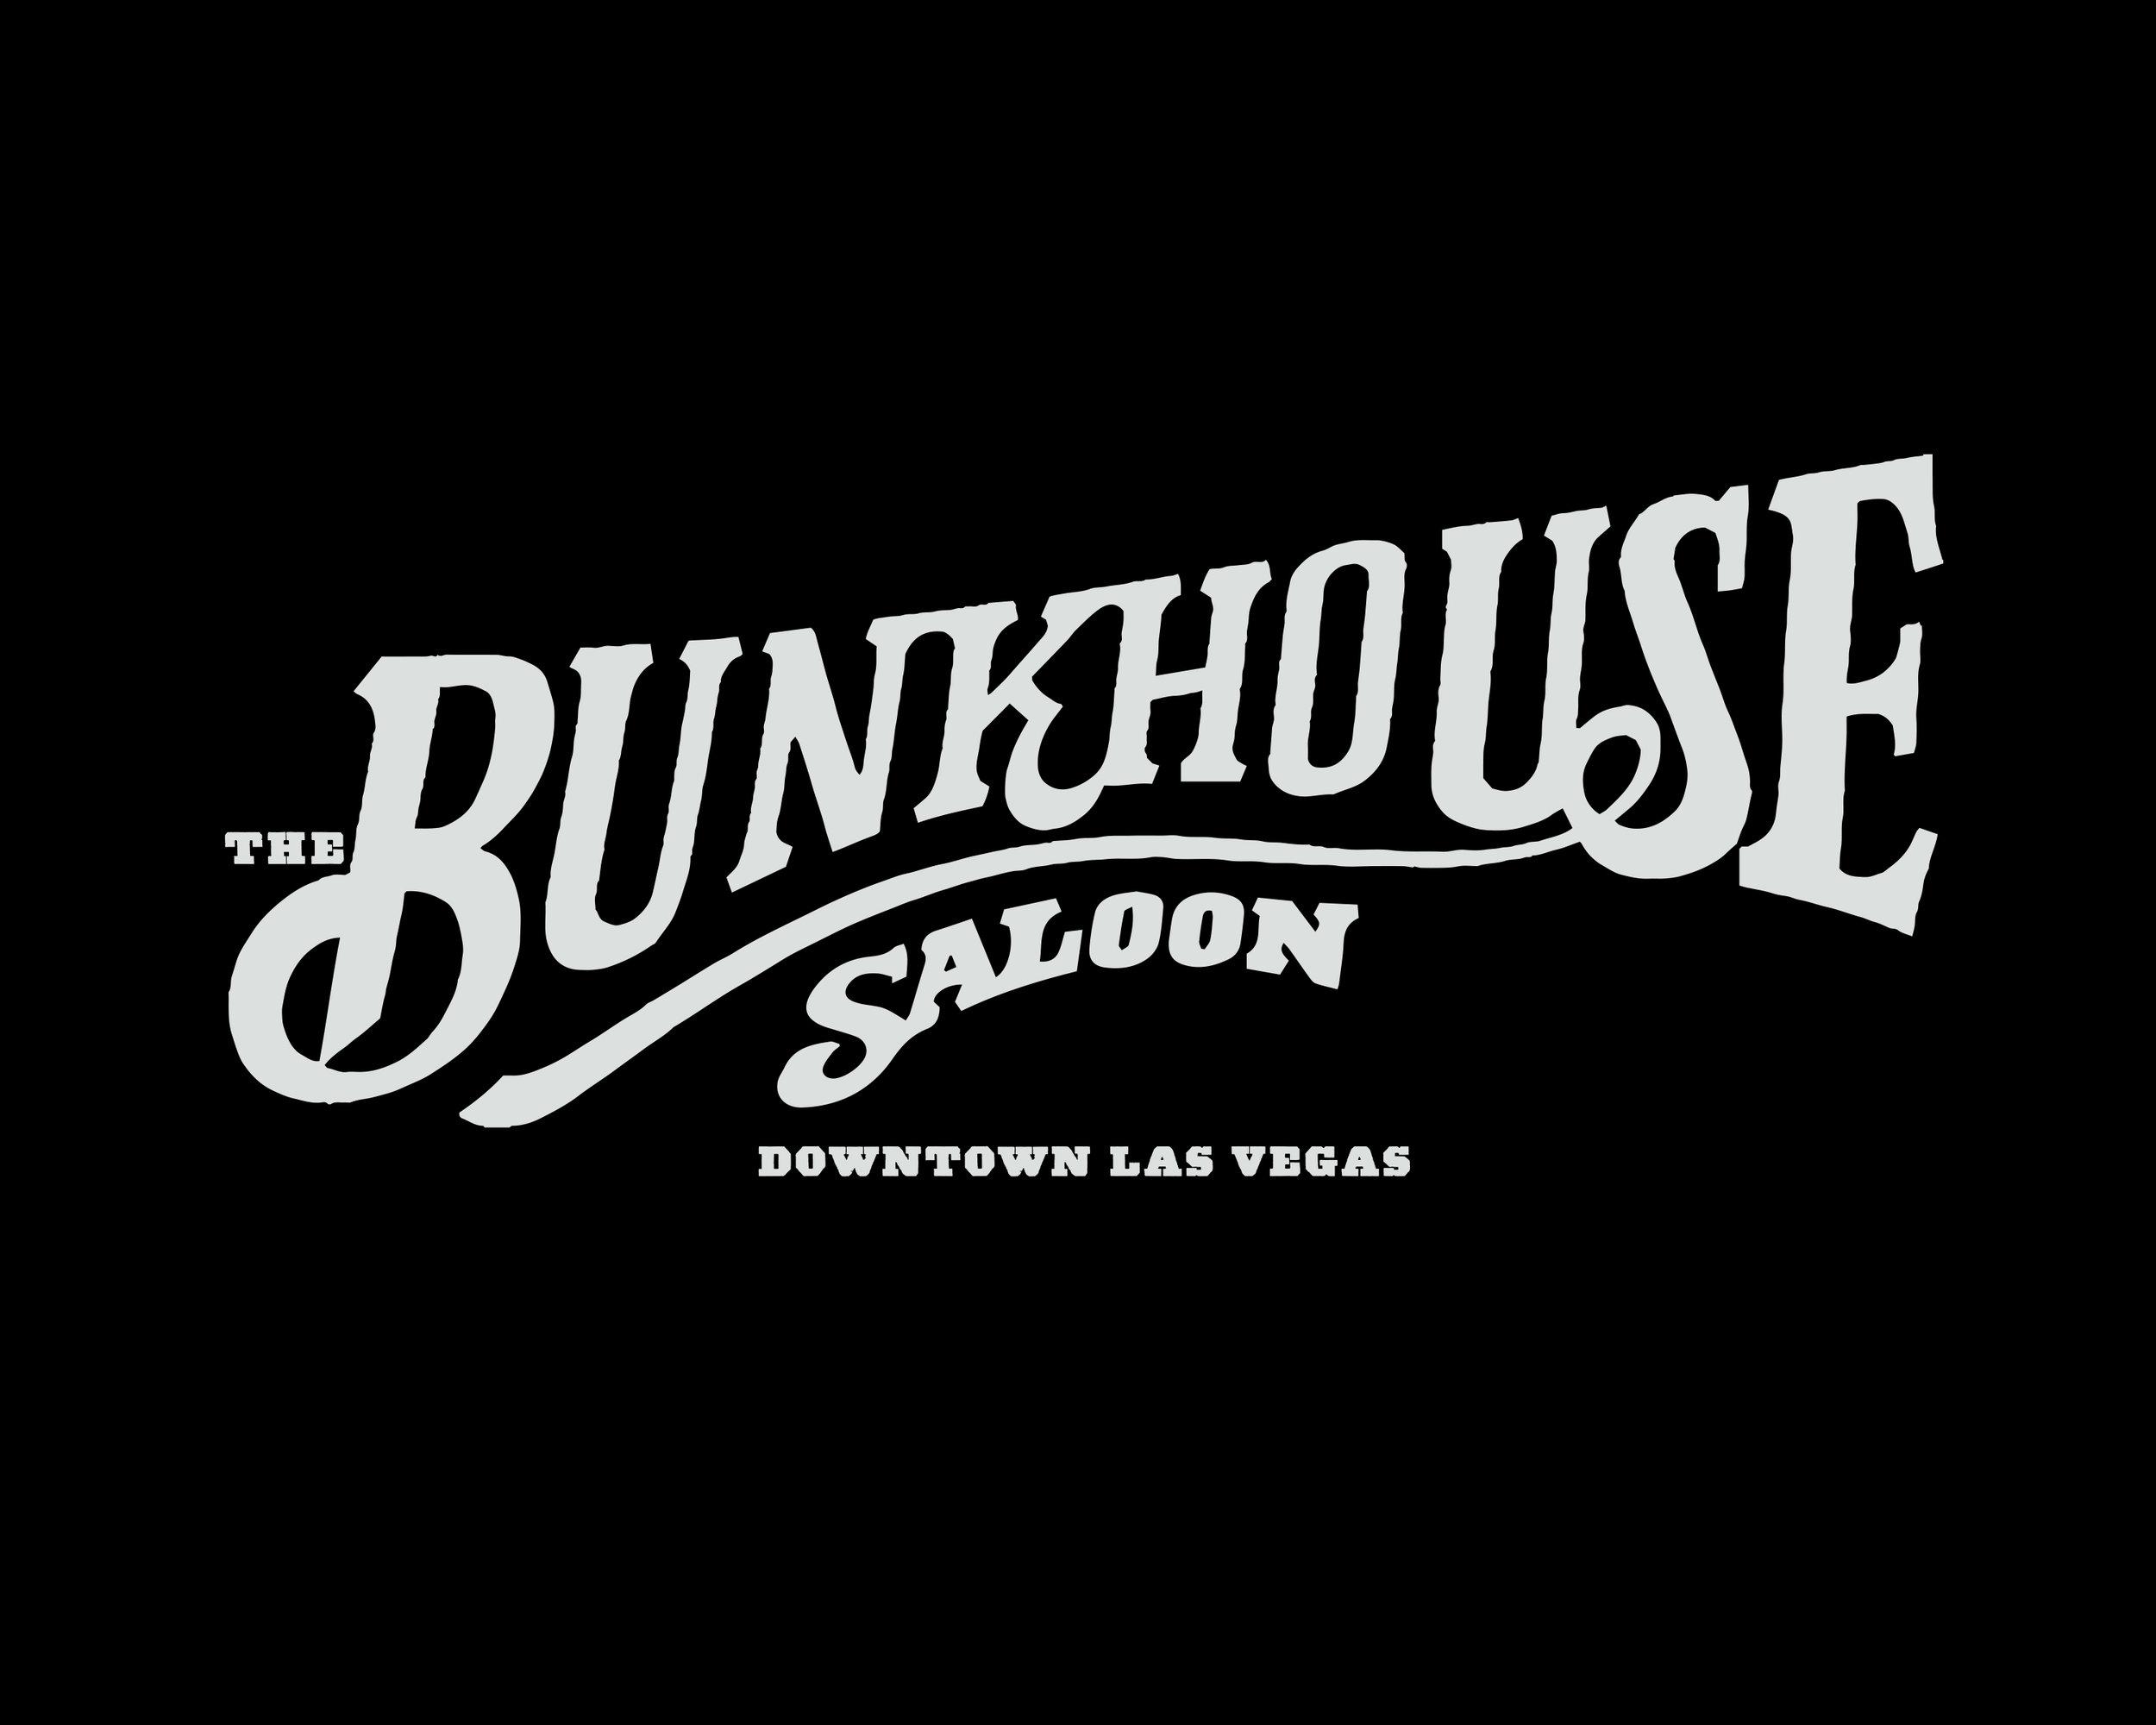 Bunkhouse_black.jpg